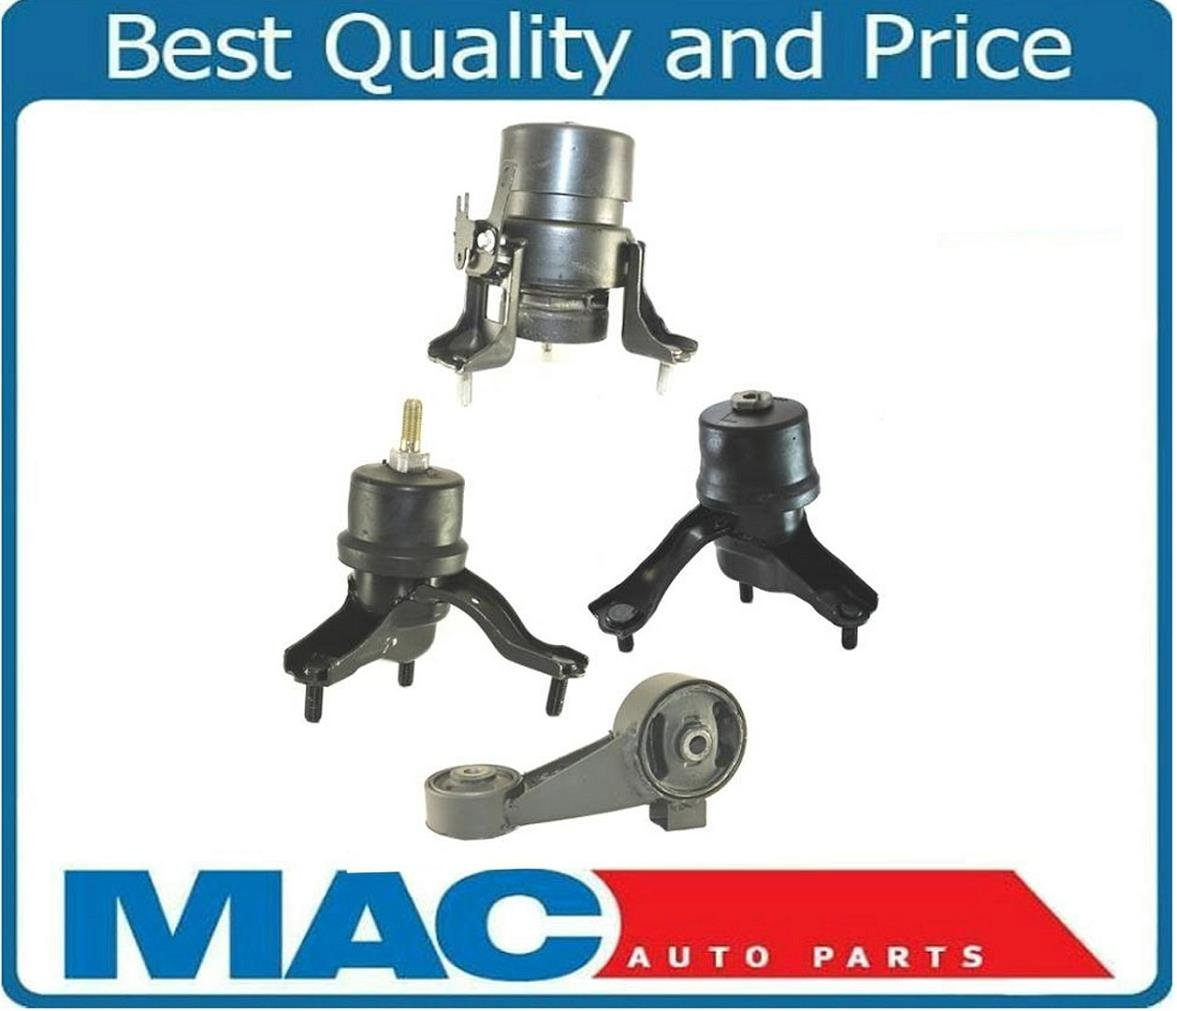 Motor Mount /& Transmission Mount Set 5PCS for 2007-2009 Lexus RX350 3.5L